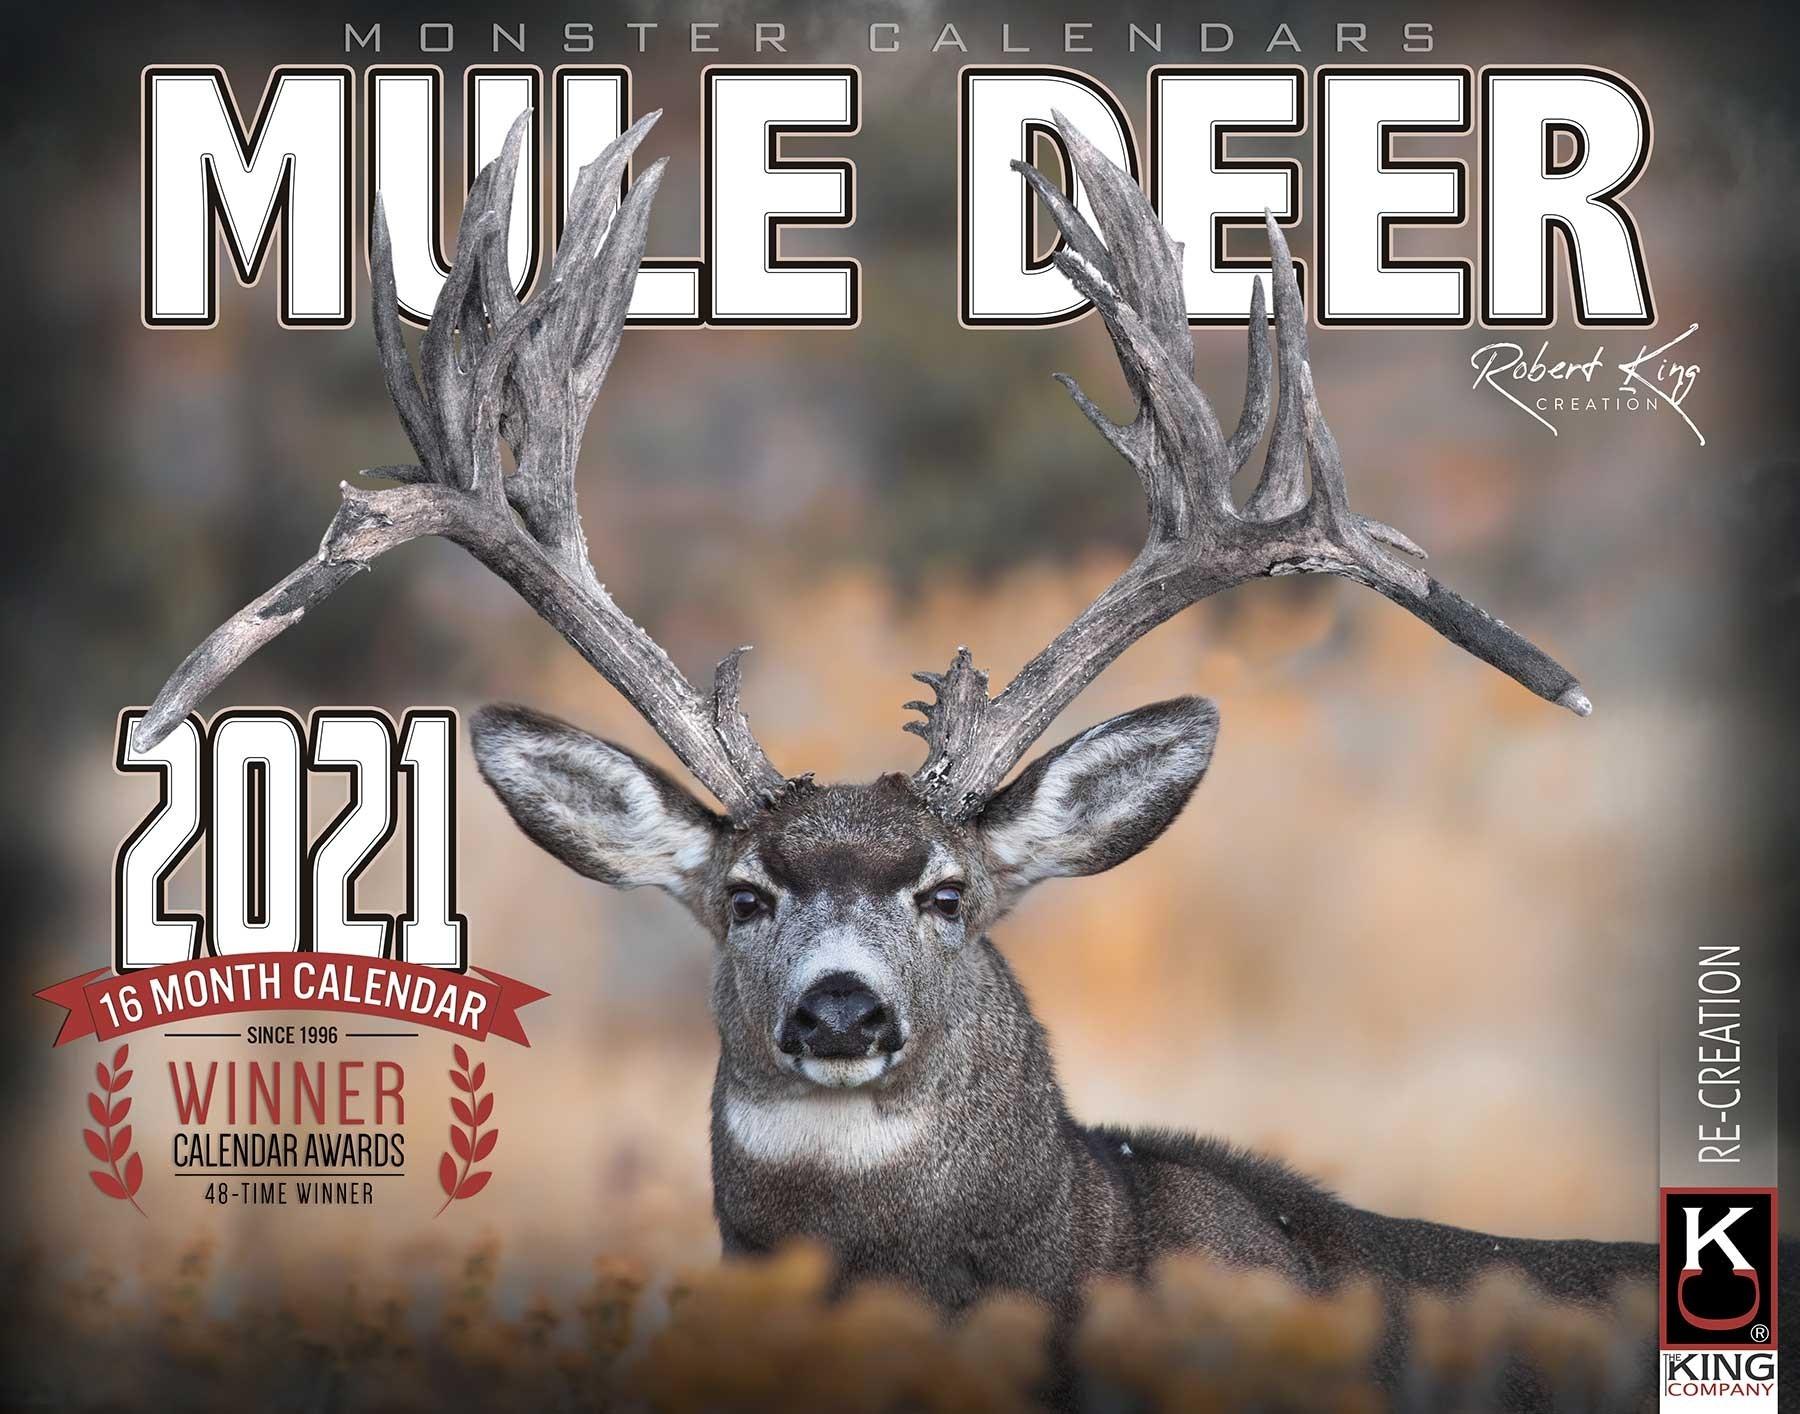 2021 Monster Mule Deer Calendar - The King Company-2021 Whitetail Rut Calendar